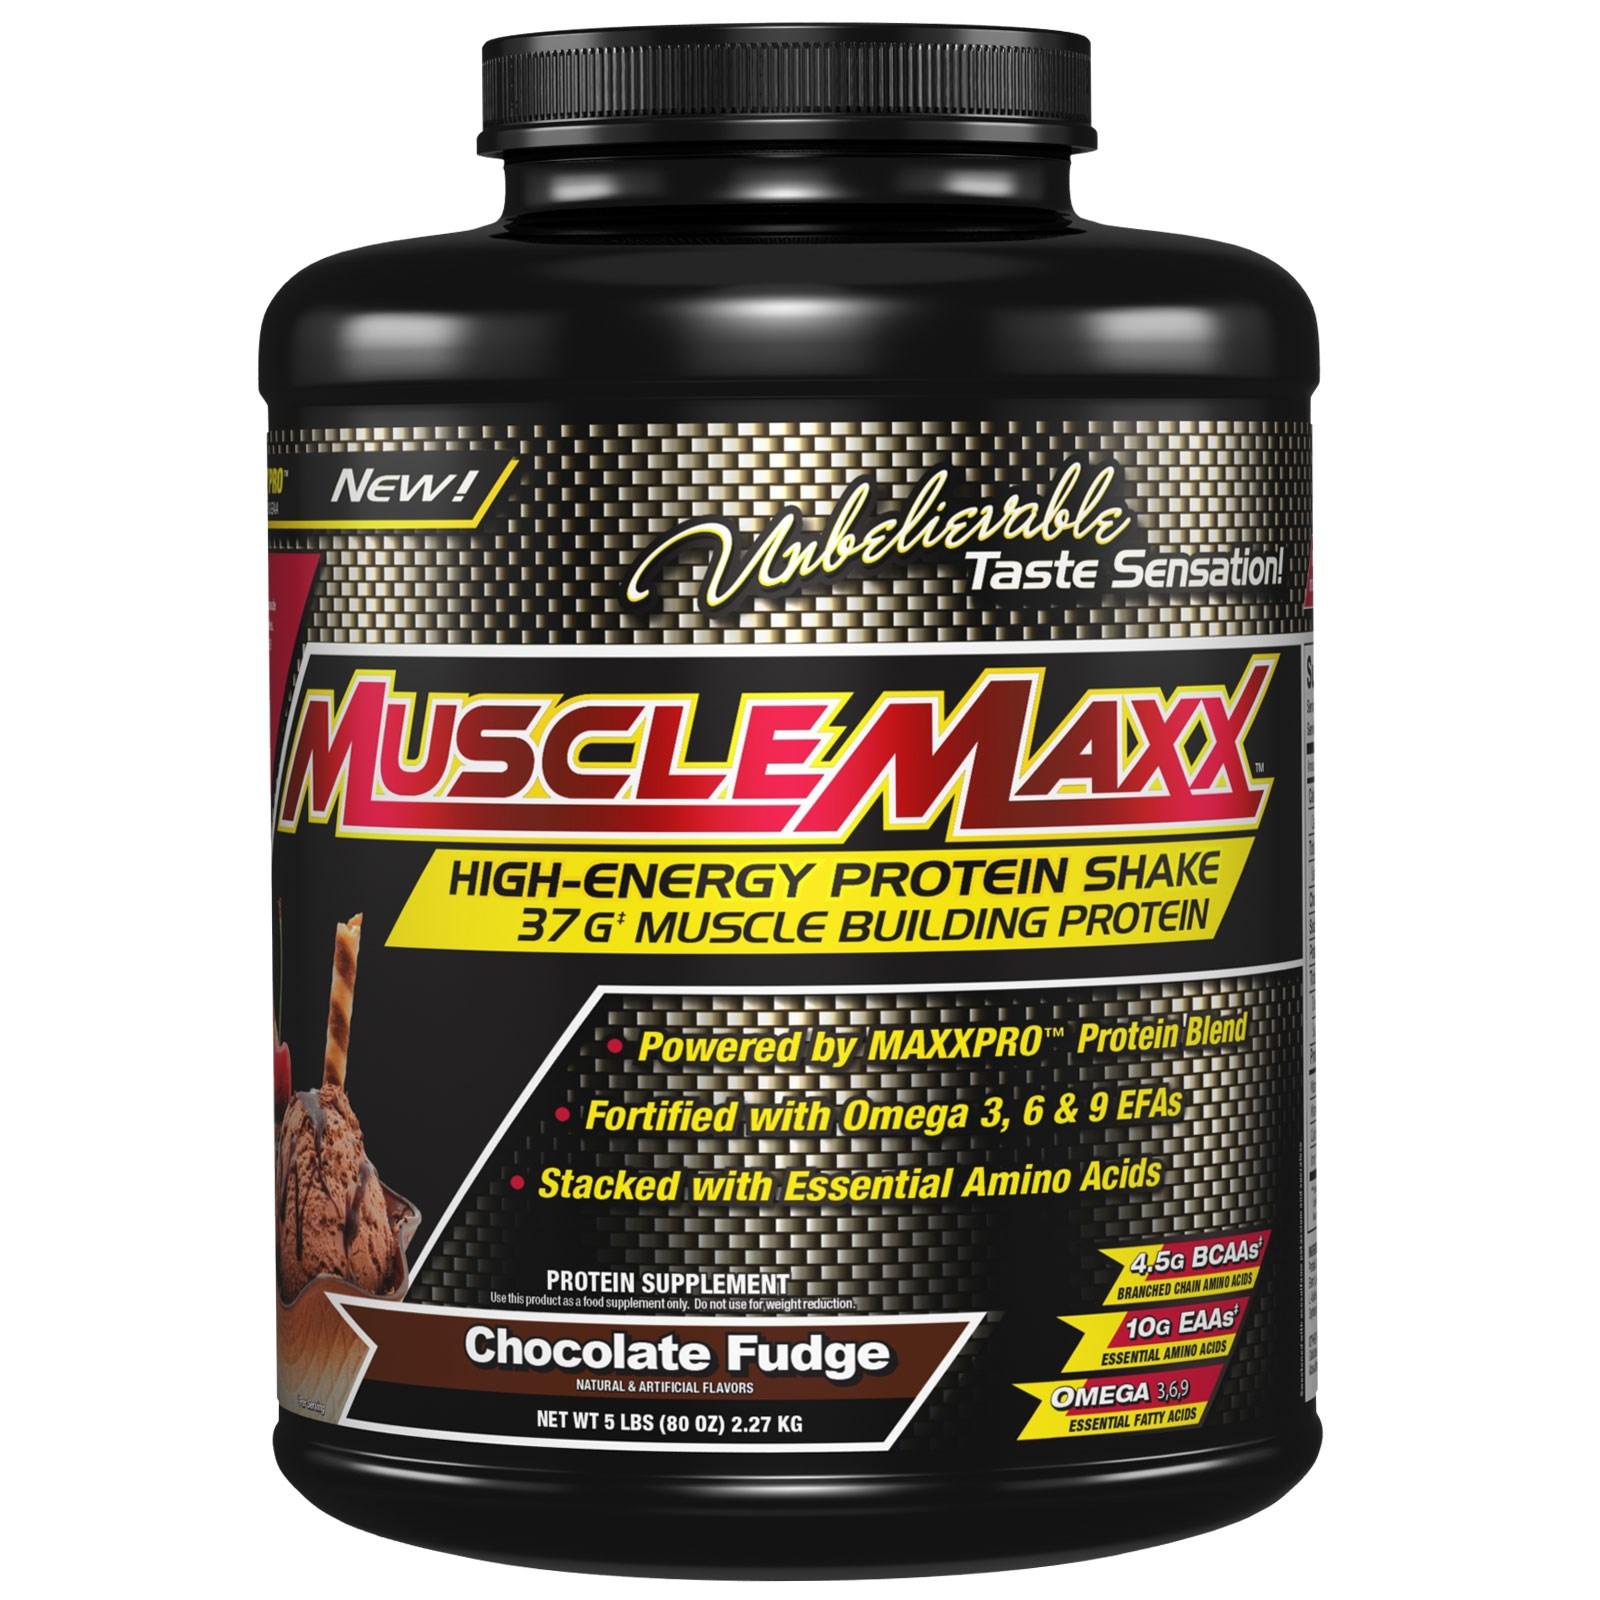 MuscleMaxx, High Energy Protein Shake, Chocolate Fudge, 80 oz (2.27 kg)